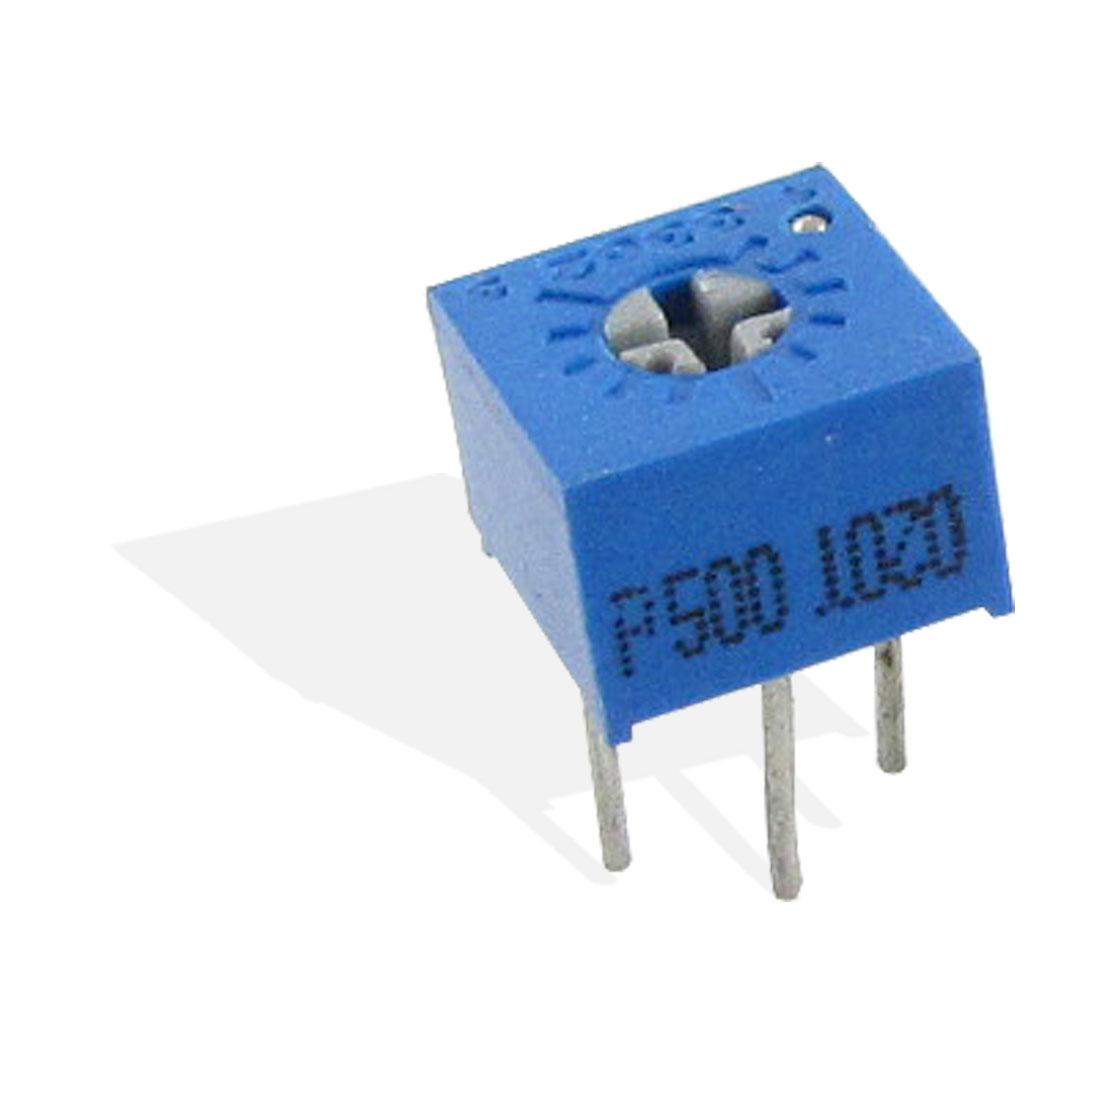 5 x 50 ohm DIP 3 Pins Potentioment Variable Resistors